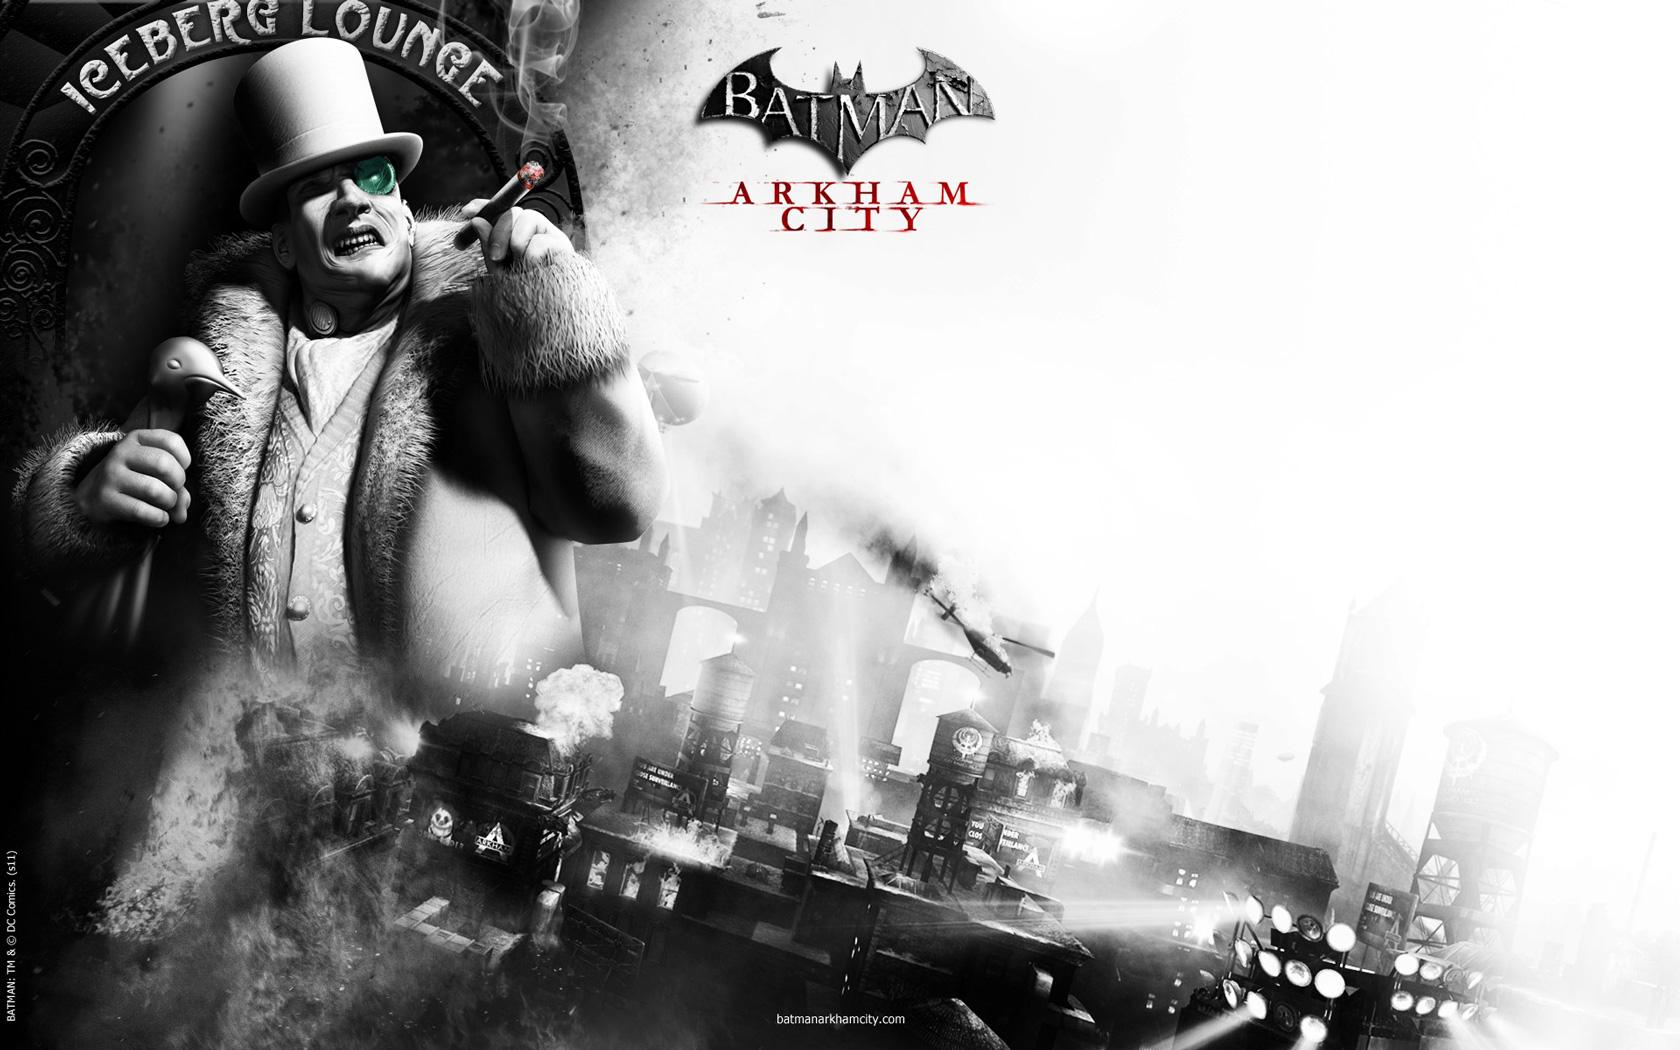 Batman: Arkham City Wallpaper in 1680x1050